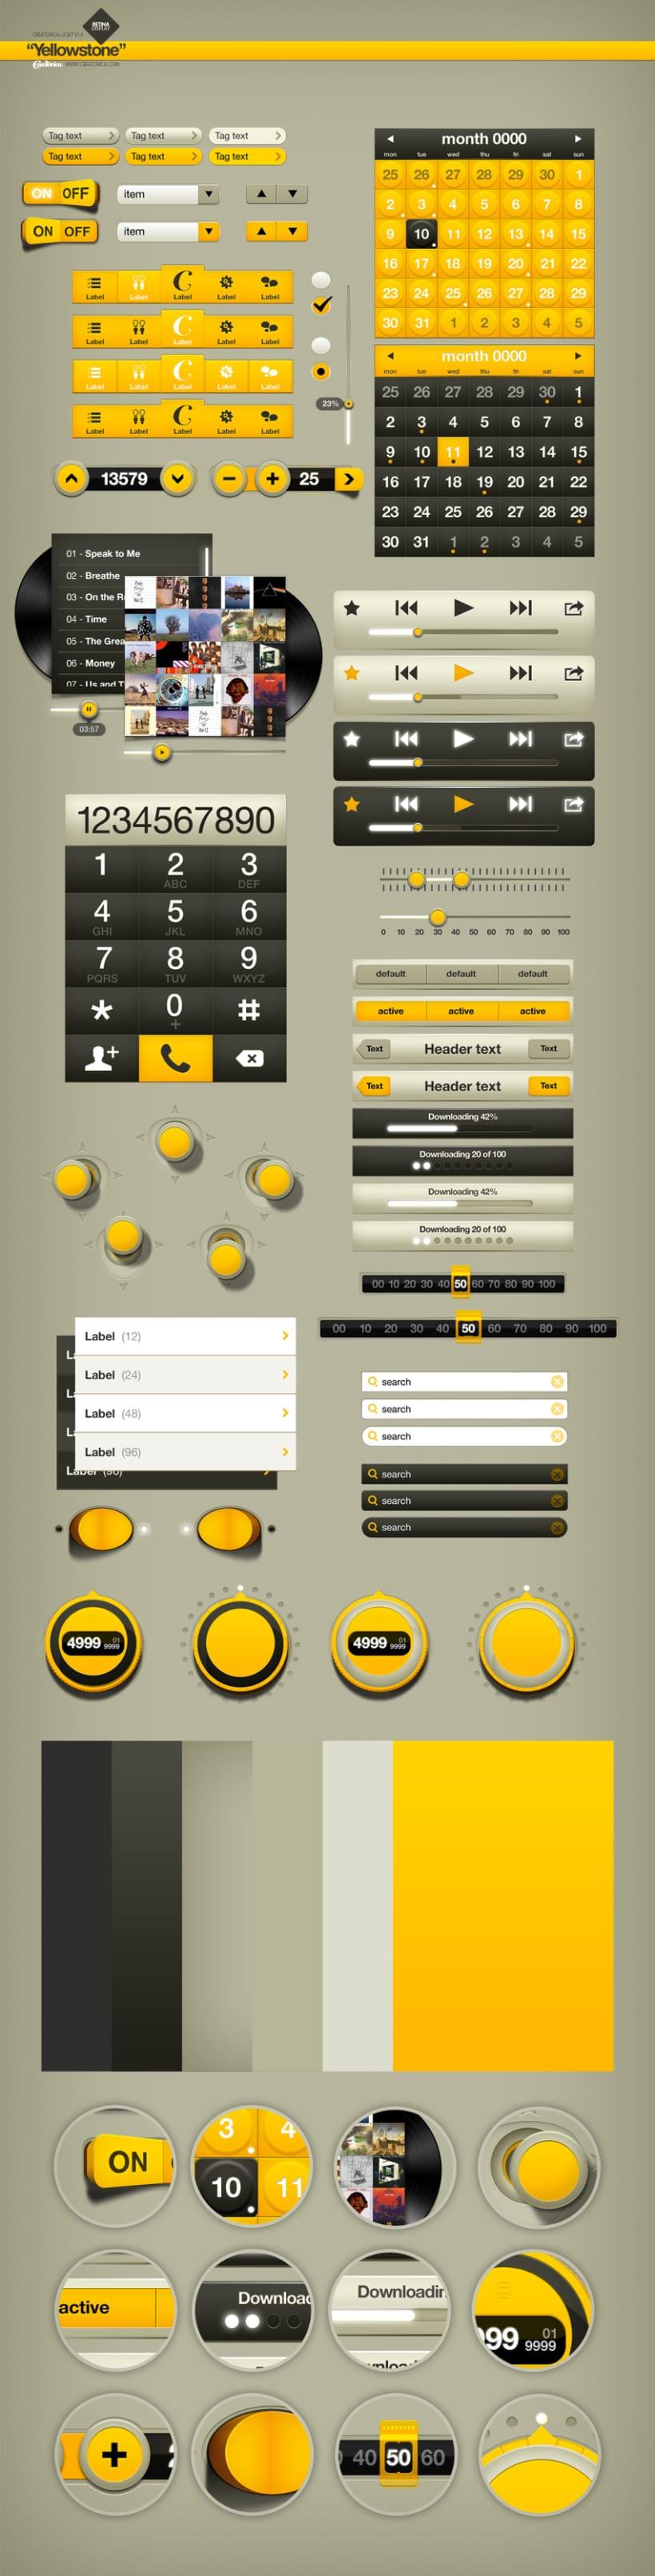 Creatorica UI Set - Yellowstone 2